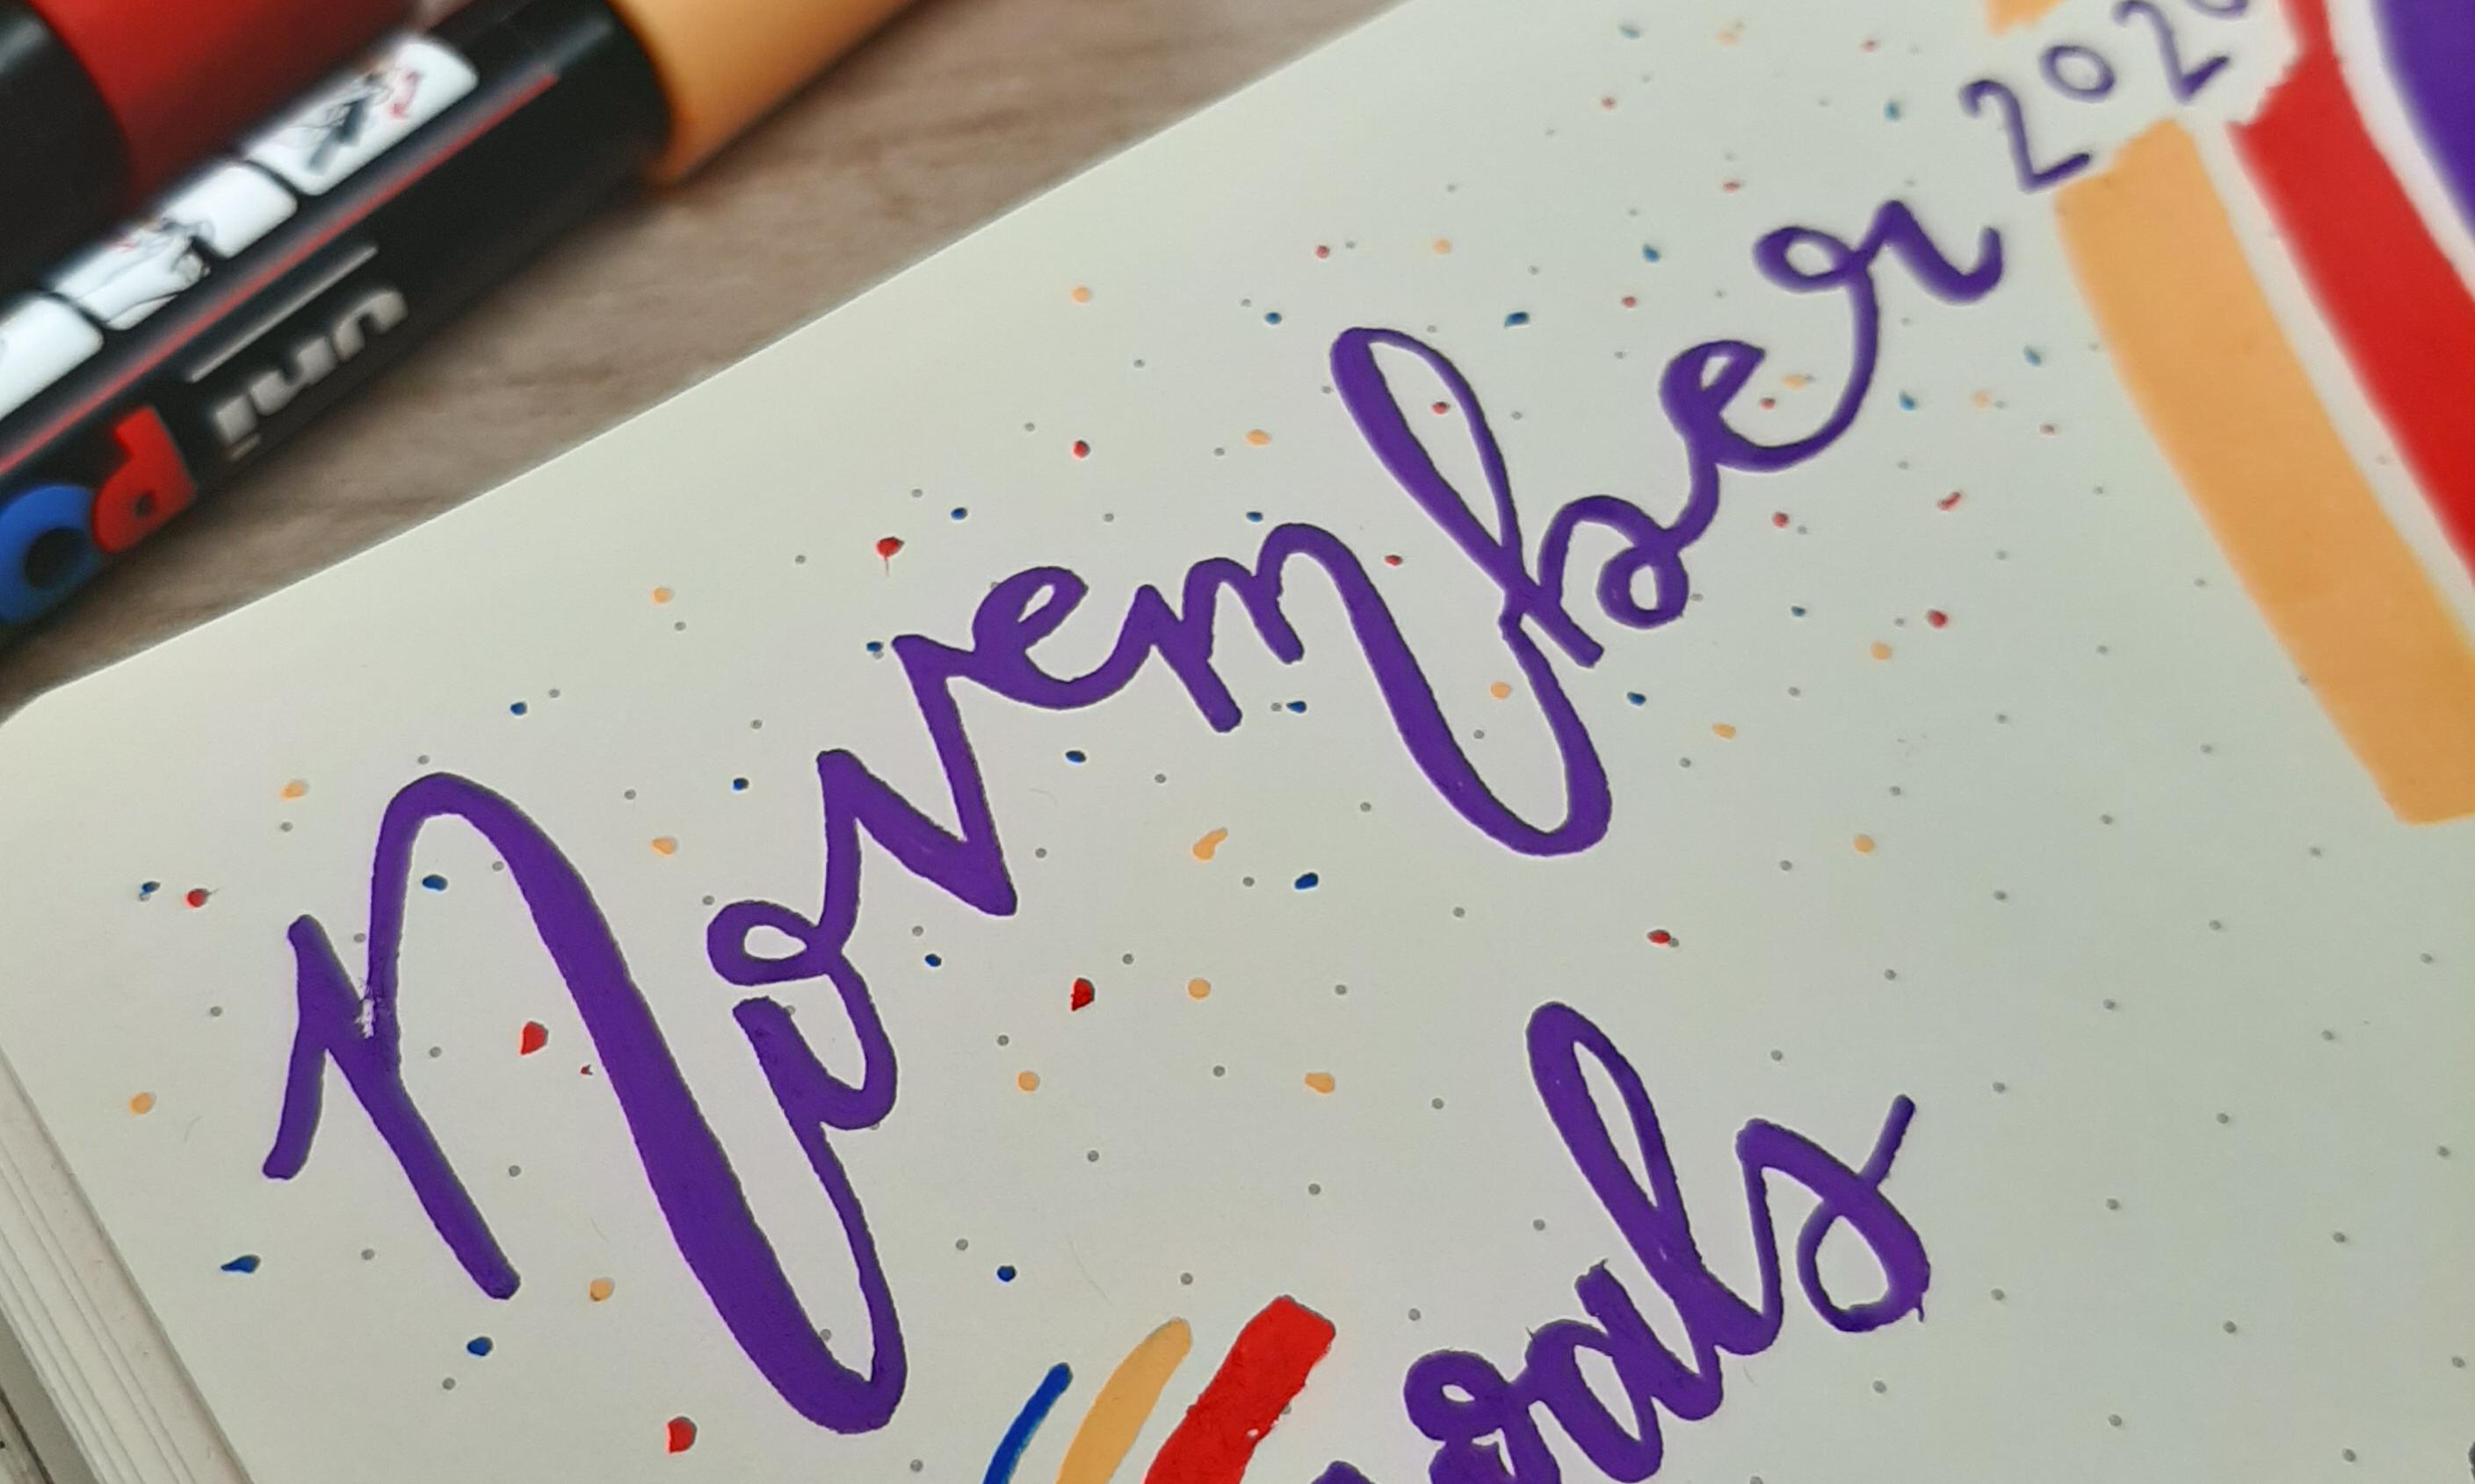 November written in purple calligraphy